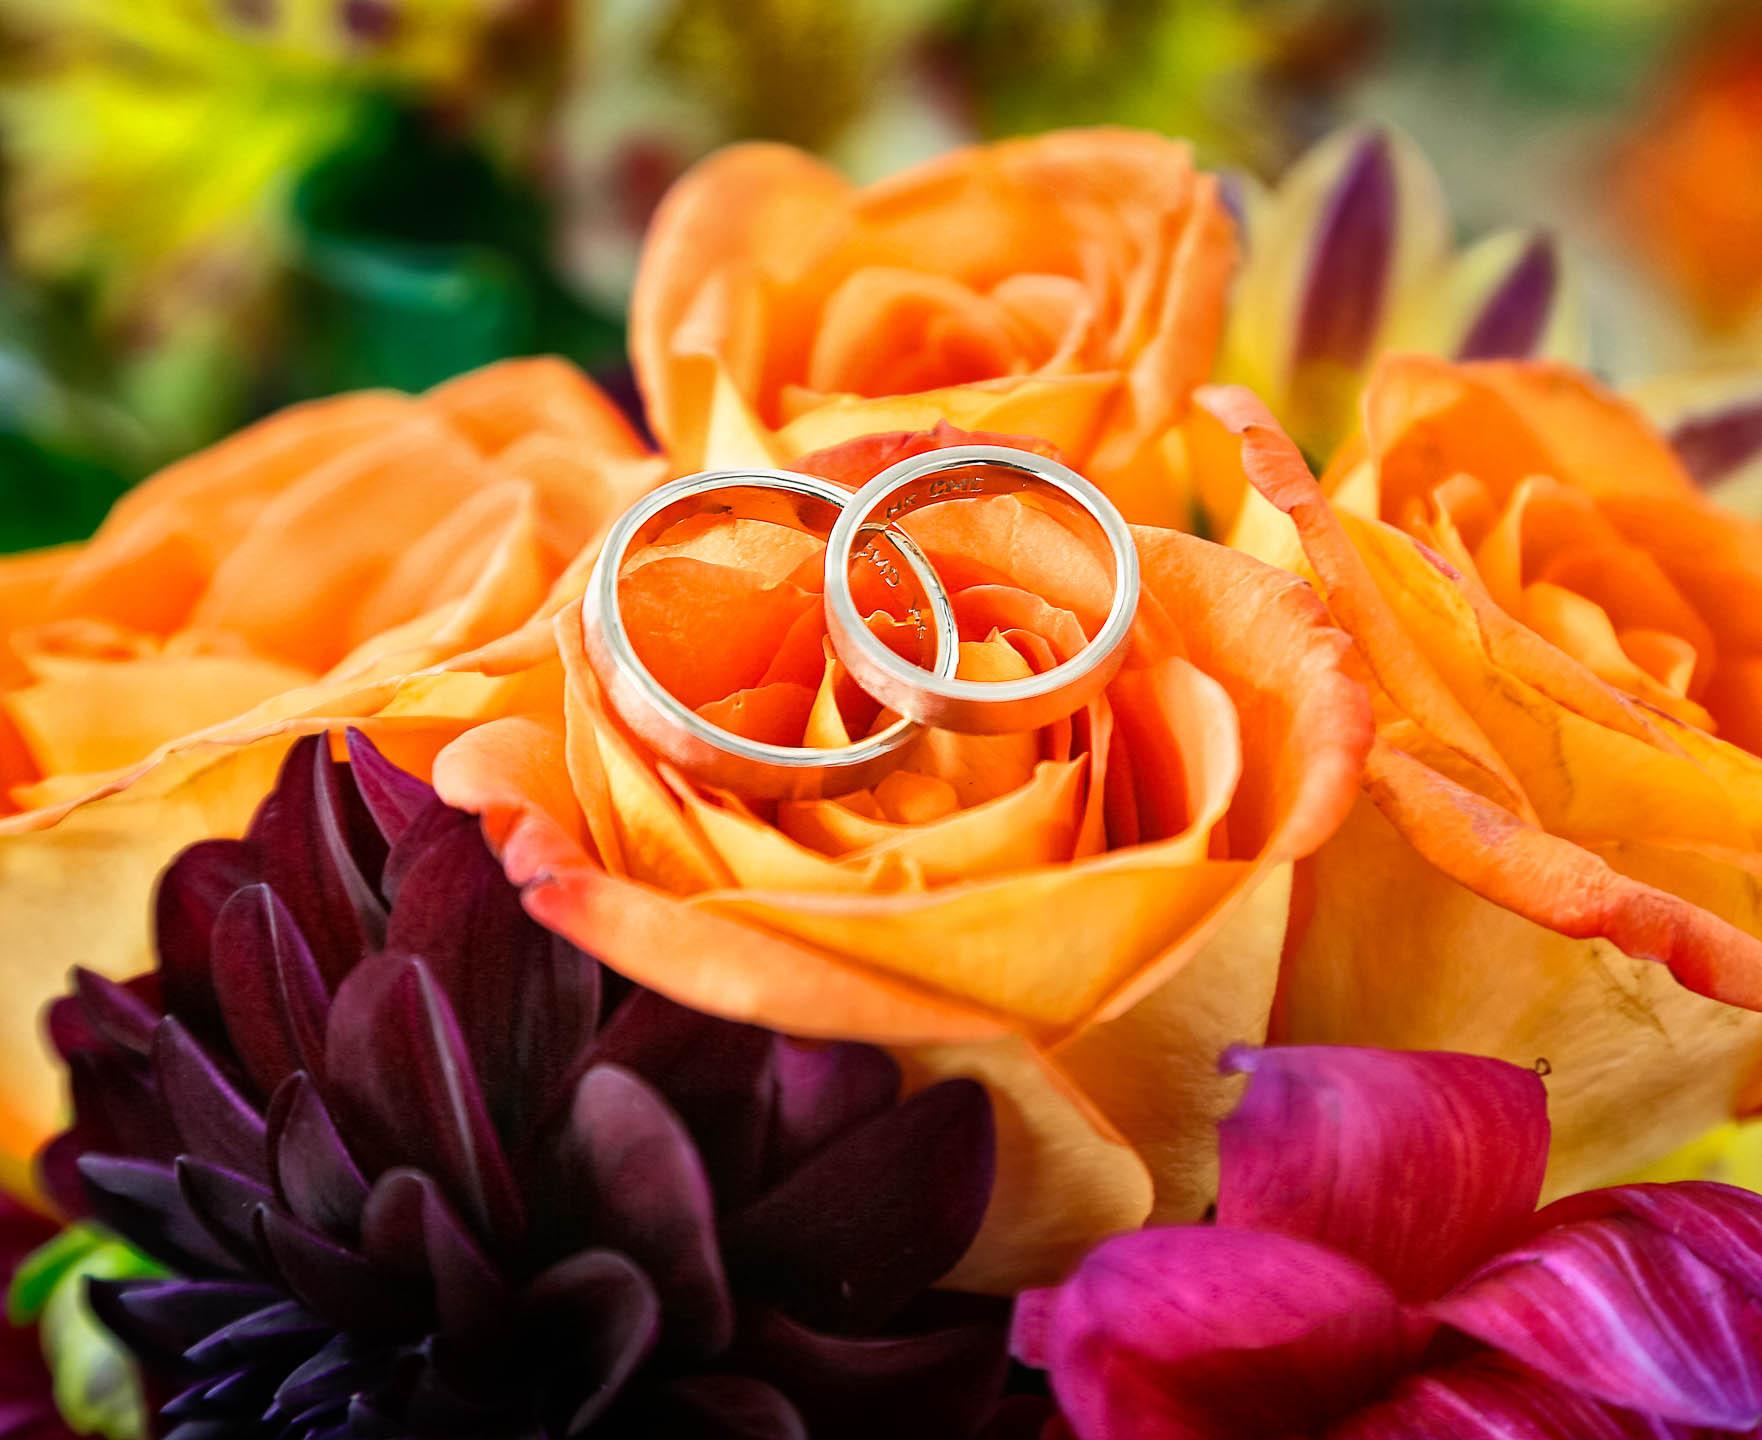 WEDDING-Karen-Mark-28Sep2014-MTO0138-Edit-Edit.jpg